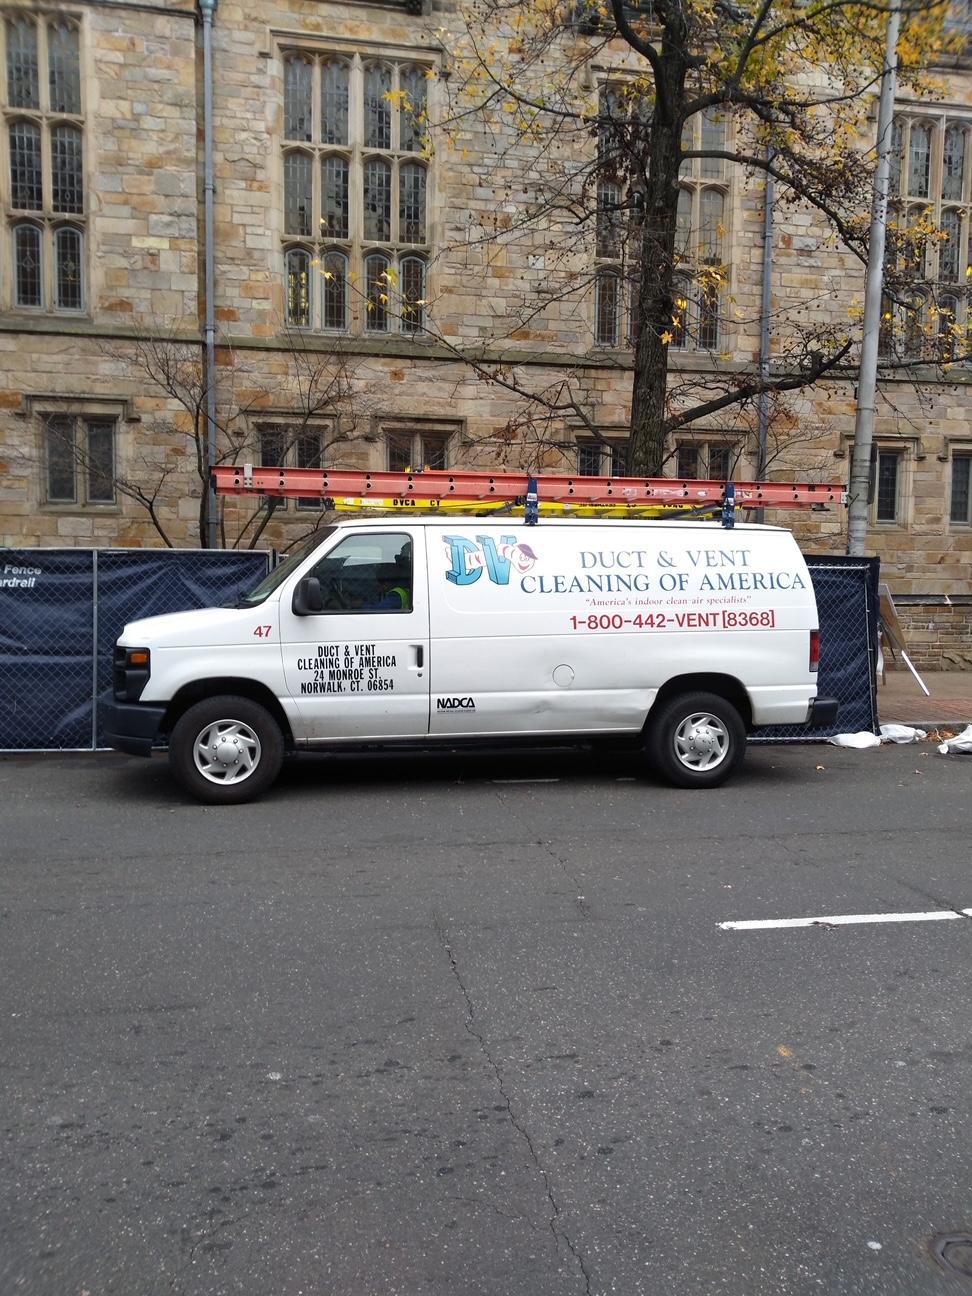 Yale University Brandford College – New Haven, CT image002.jpg